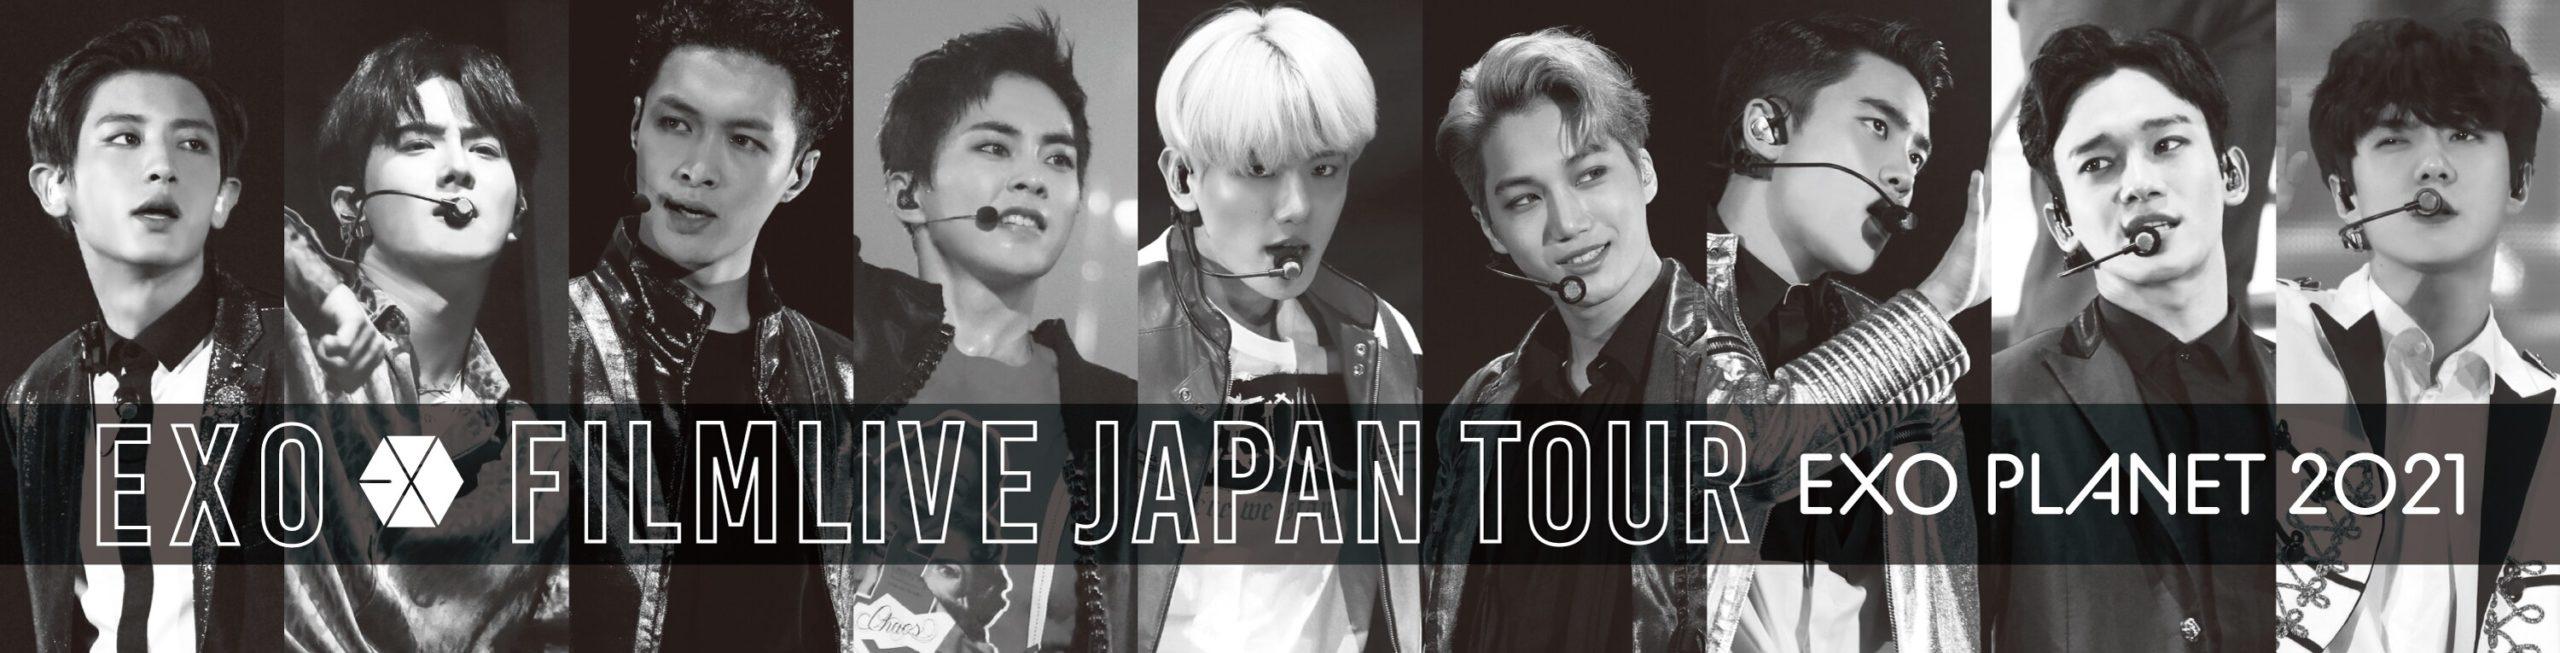 EXO FILMLIVE JAPAN TOUR - EXO PLANET 2021 - [昼]